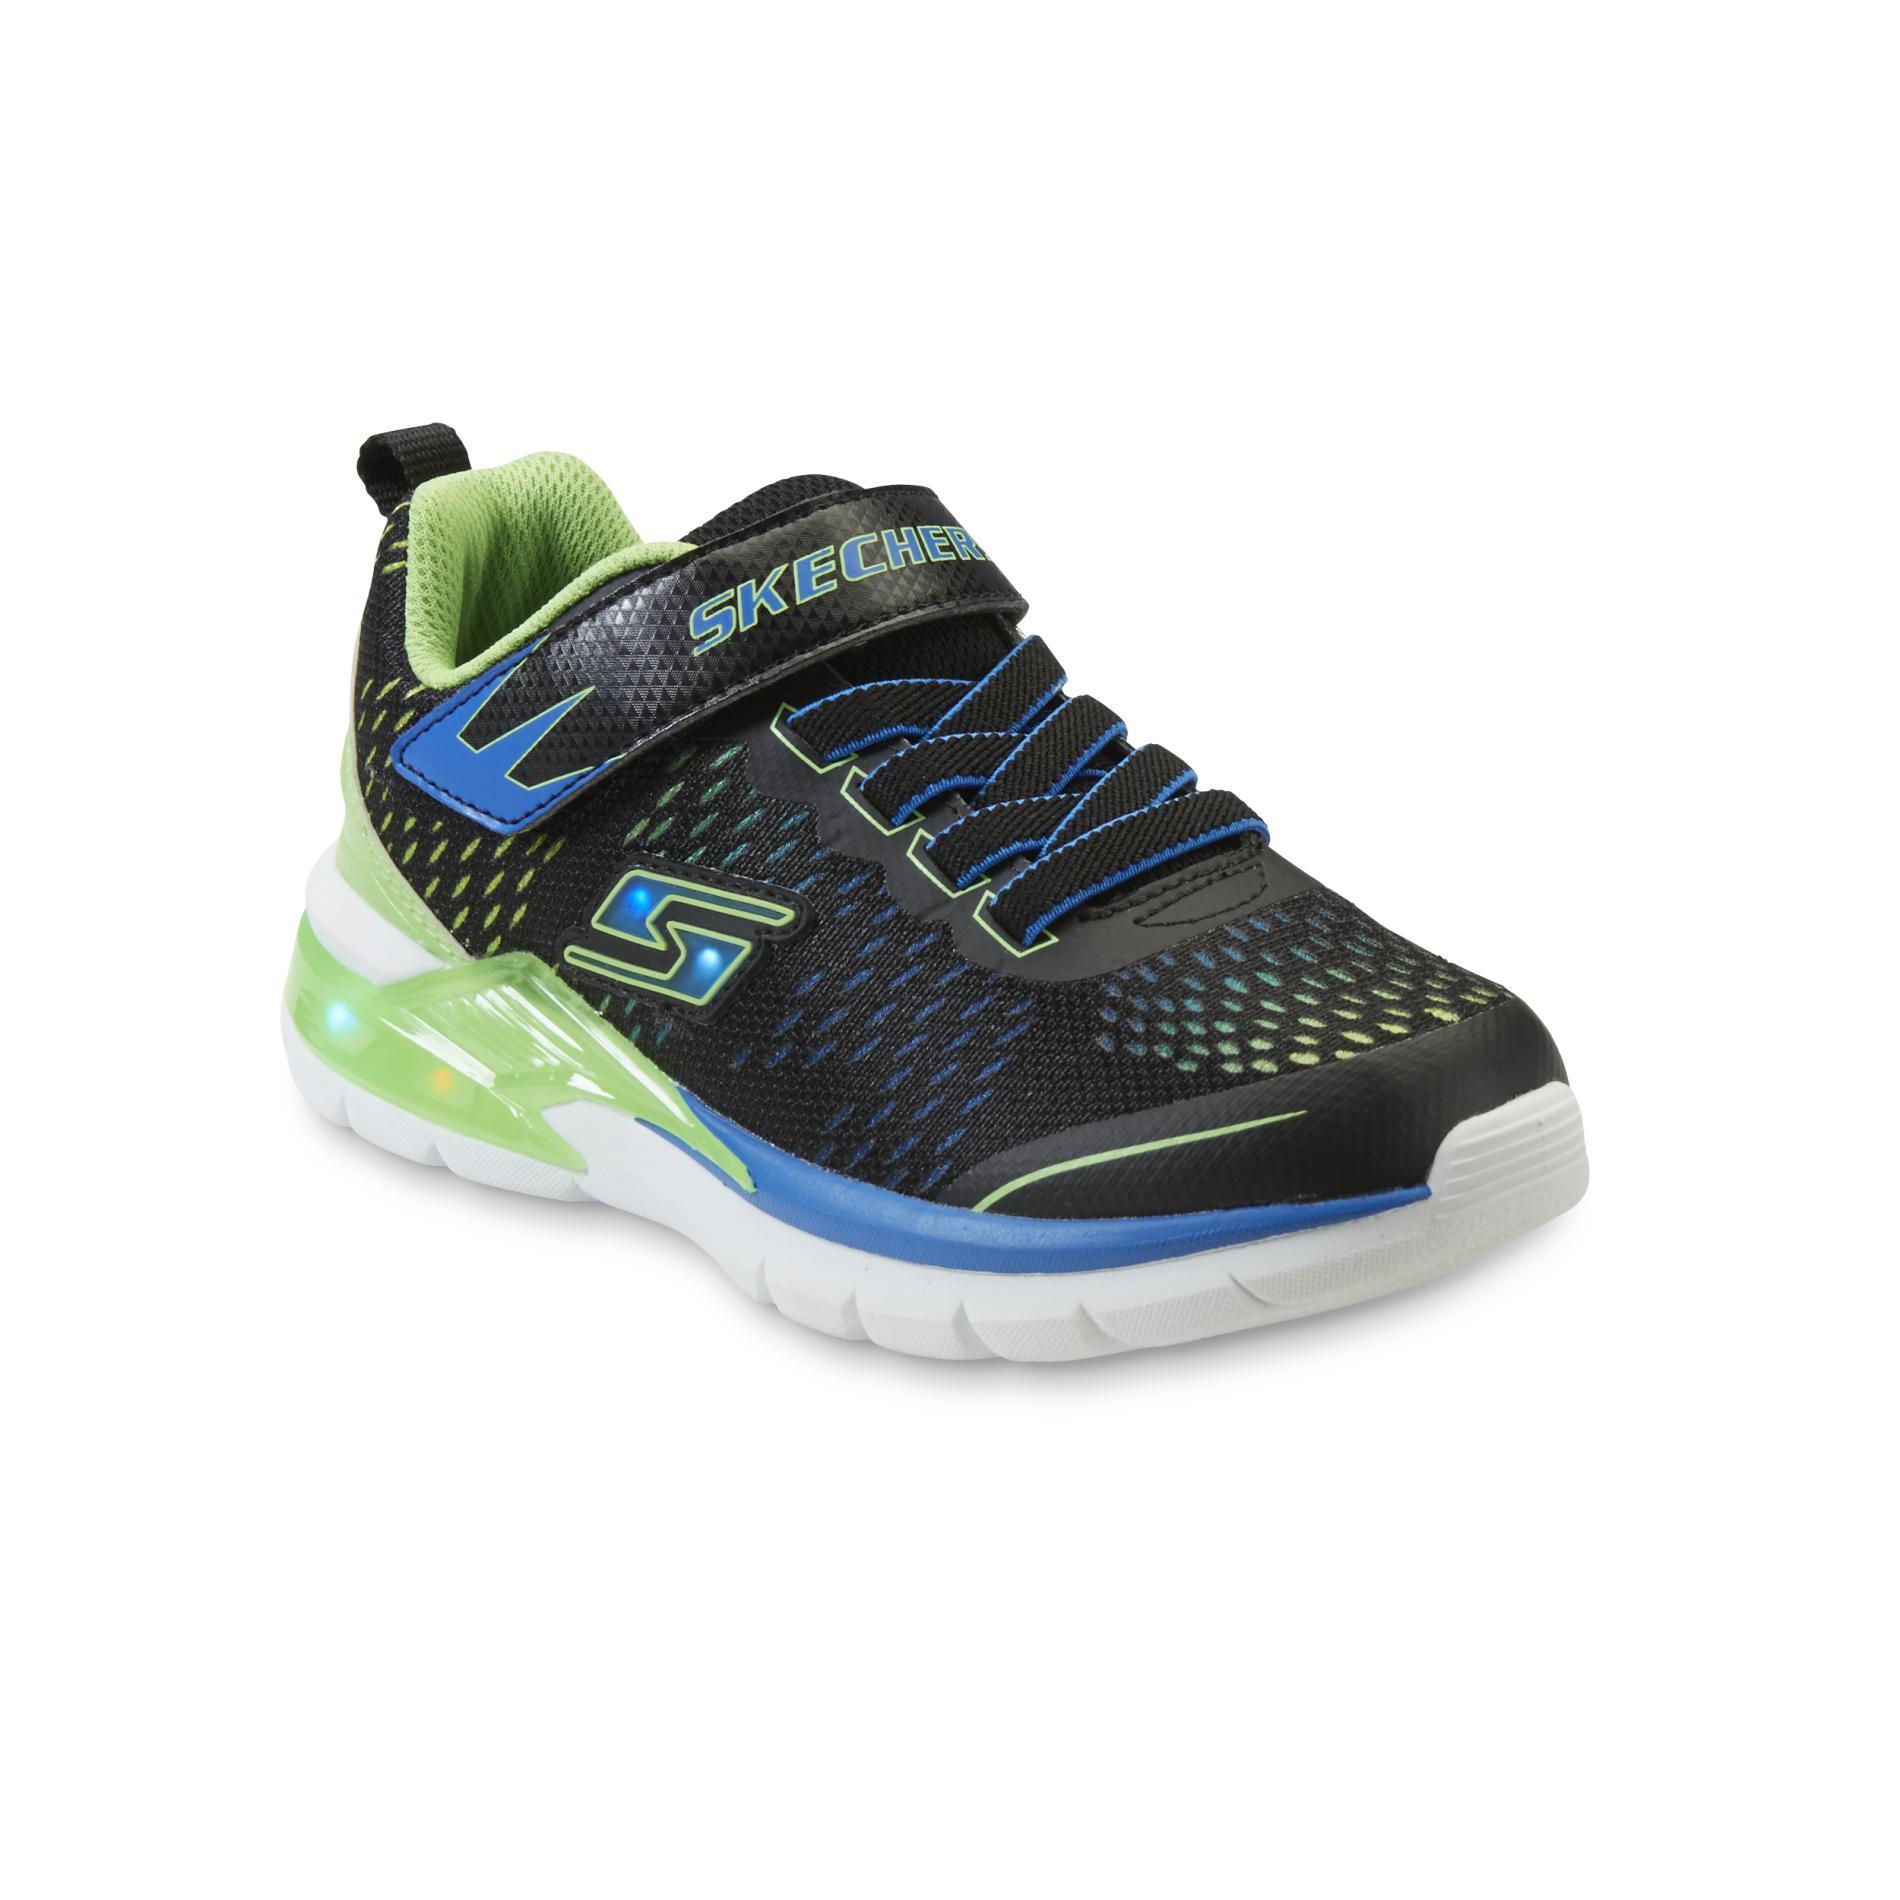 Skechers Boyu0026#39;s Erupters Black/Green/Blue Light-Up Athletic ...